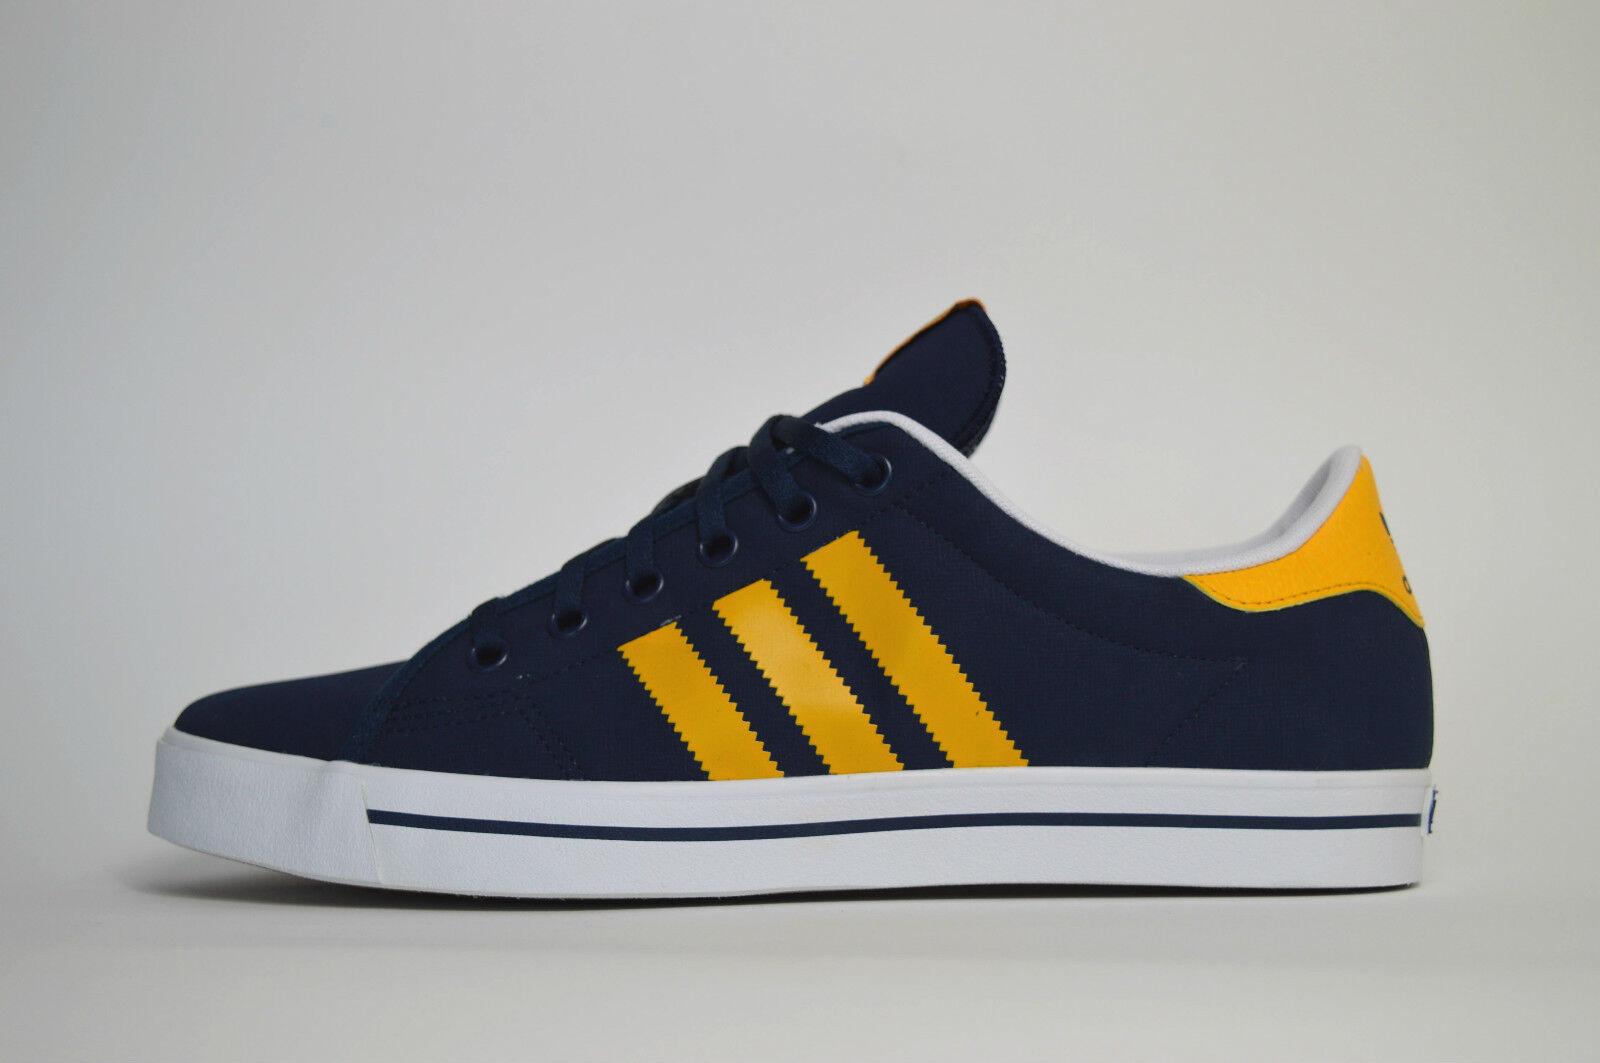 Adidas Adicourt Stripes NEU Navy Blau Herren Sneaker Schuh Freizeit max roshe zx